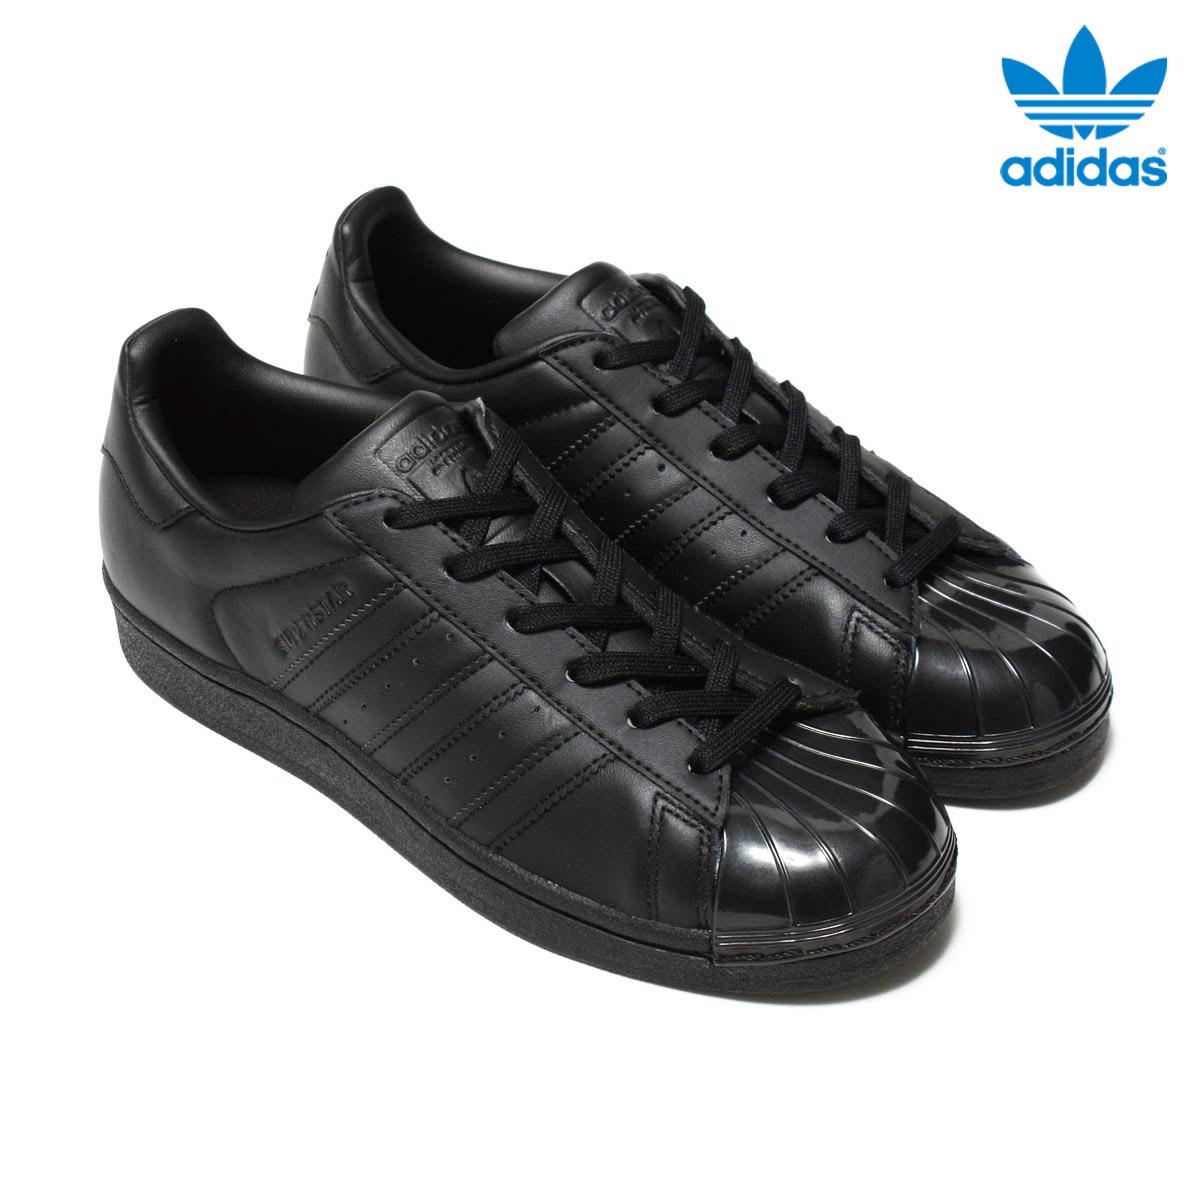 adidas Originals SUPERSTAR GLOSSY TOE W (アディダス オリジナルス スーパースター) Core Black/Core Black/Running White 【メンズ レディース】【スニーカー】16FW-I